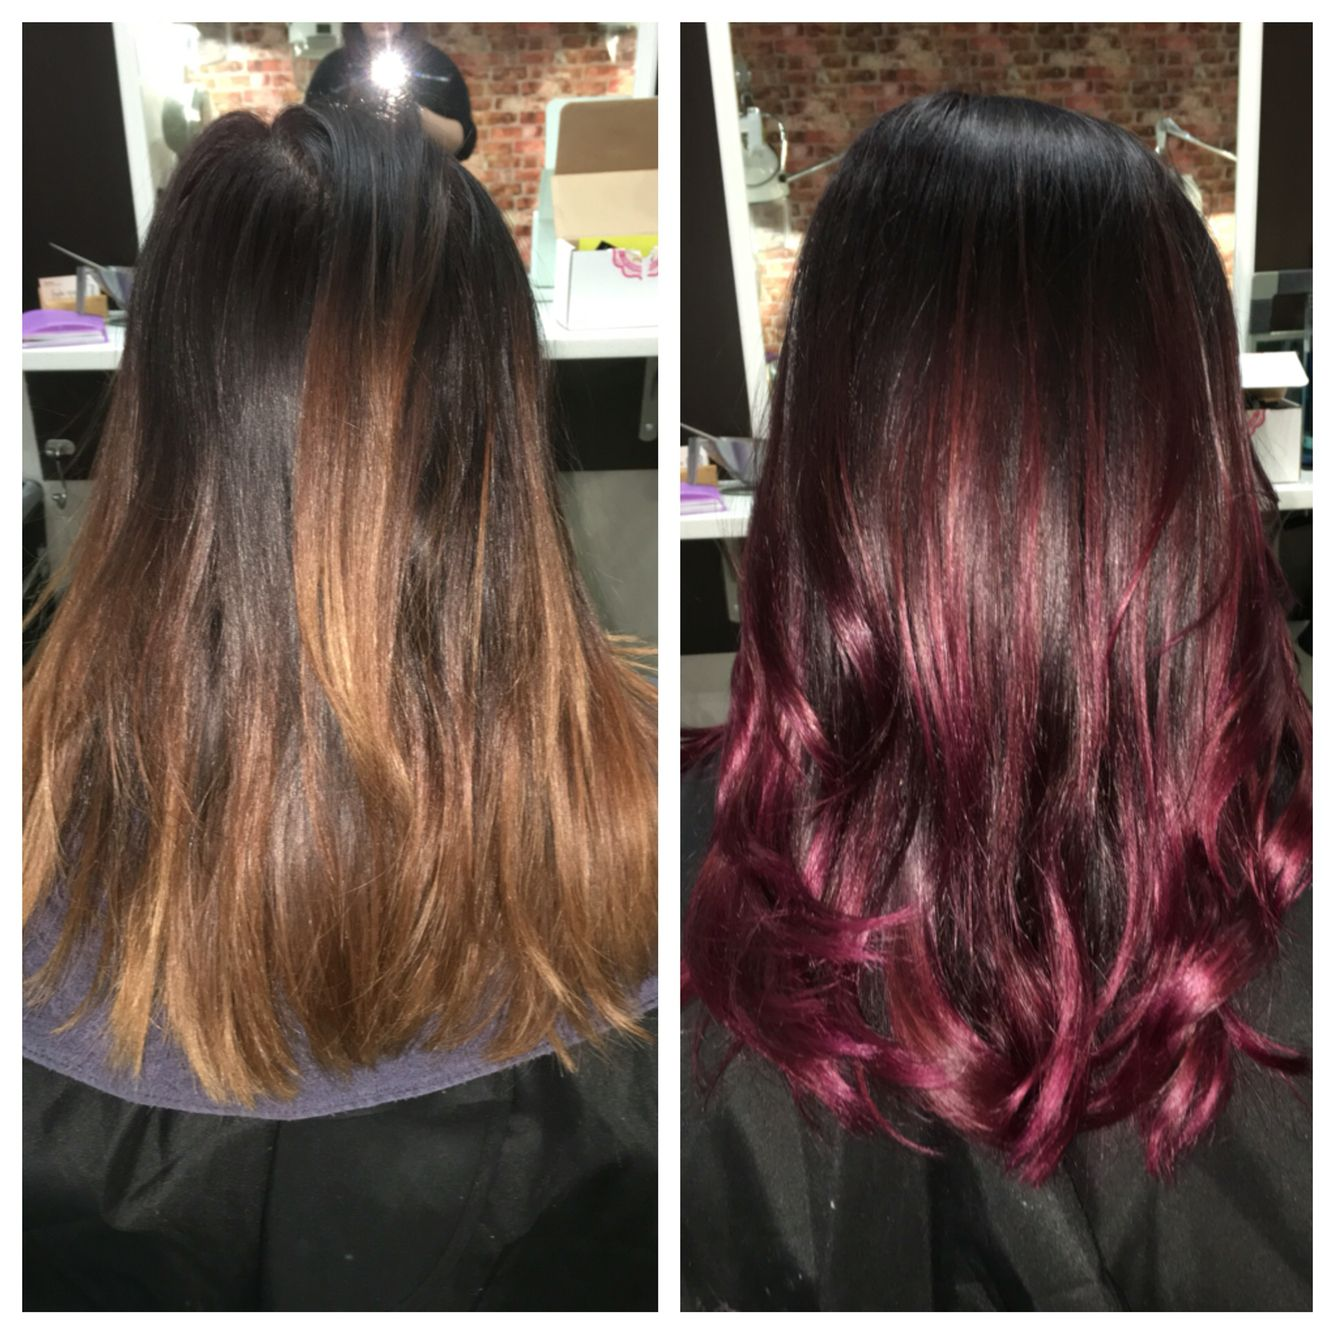 Arctic Fox Violet Dream And Virgin Pink Hair Beauty Fox Hair Dye Hair Skin